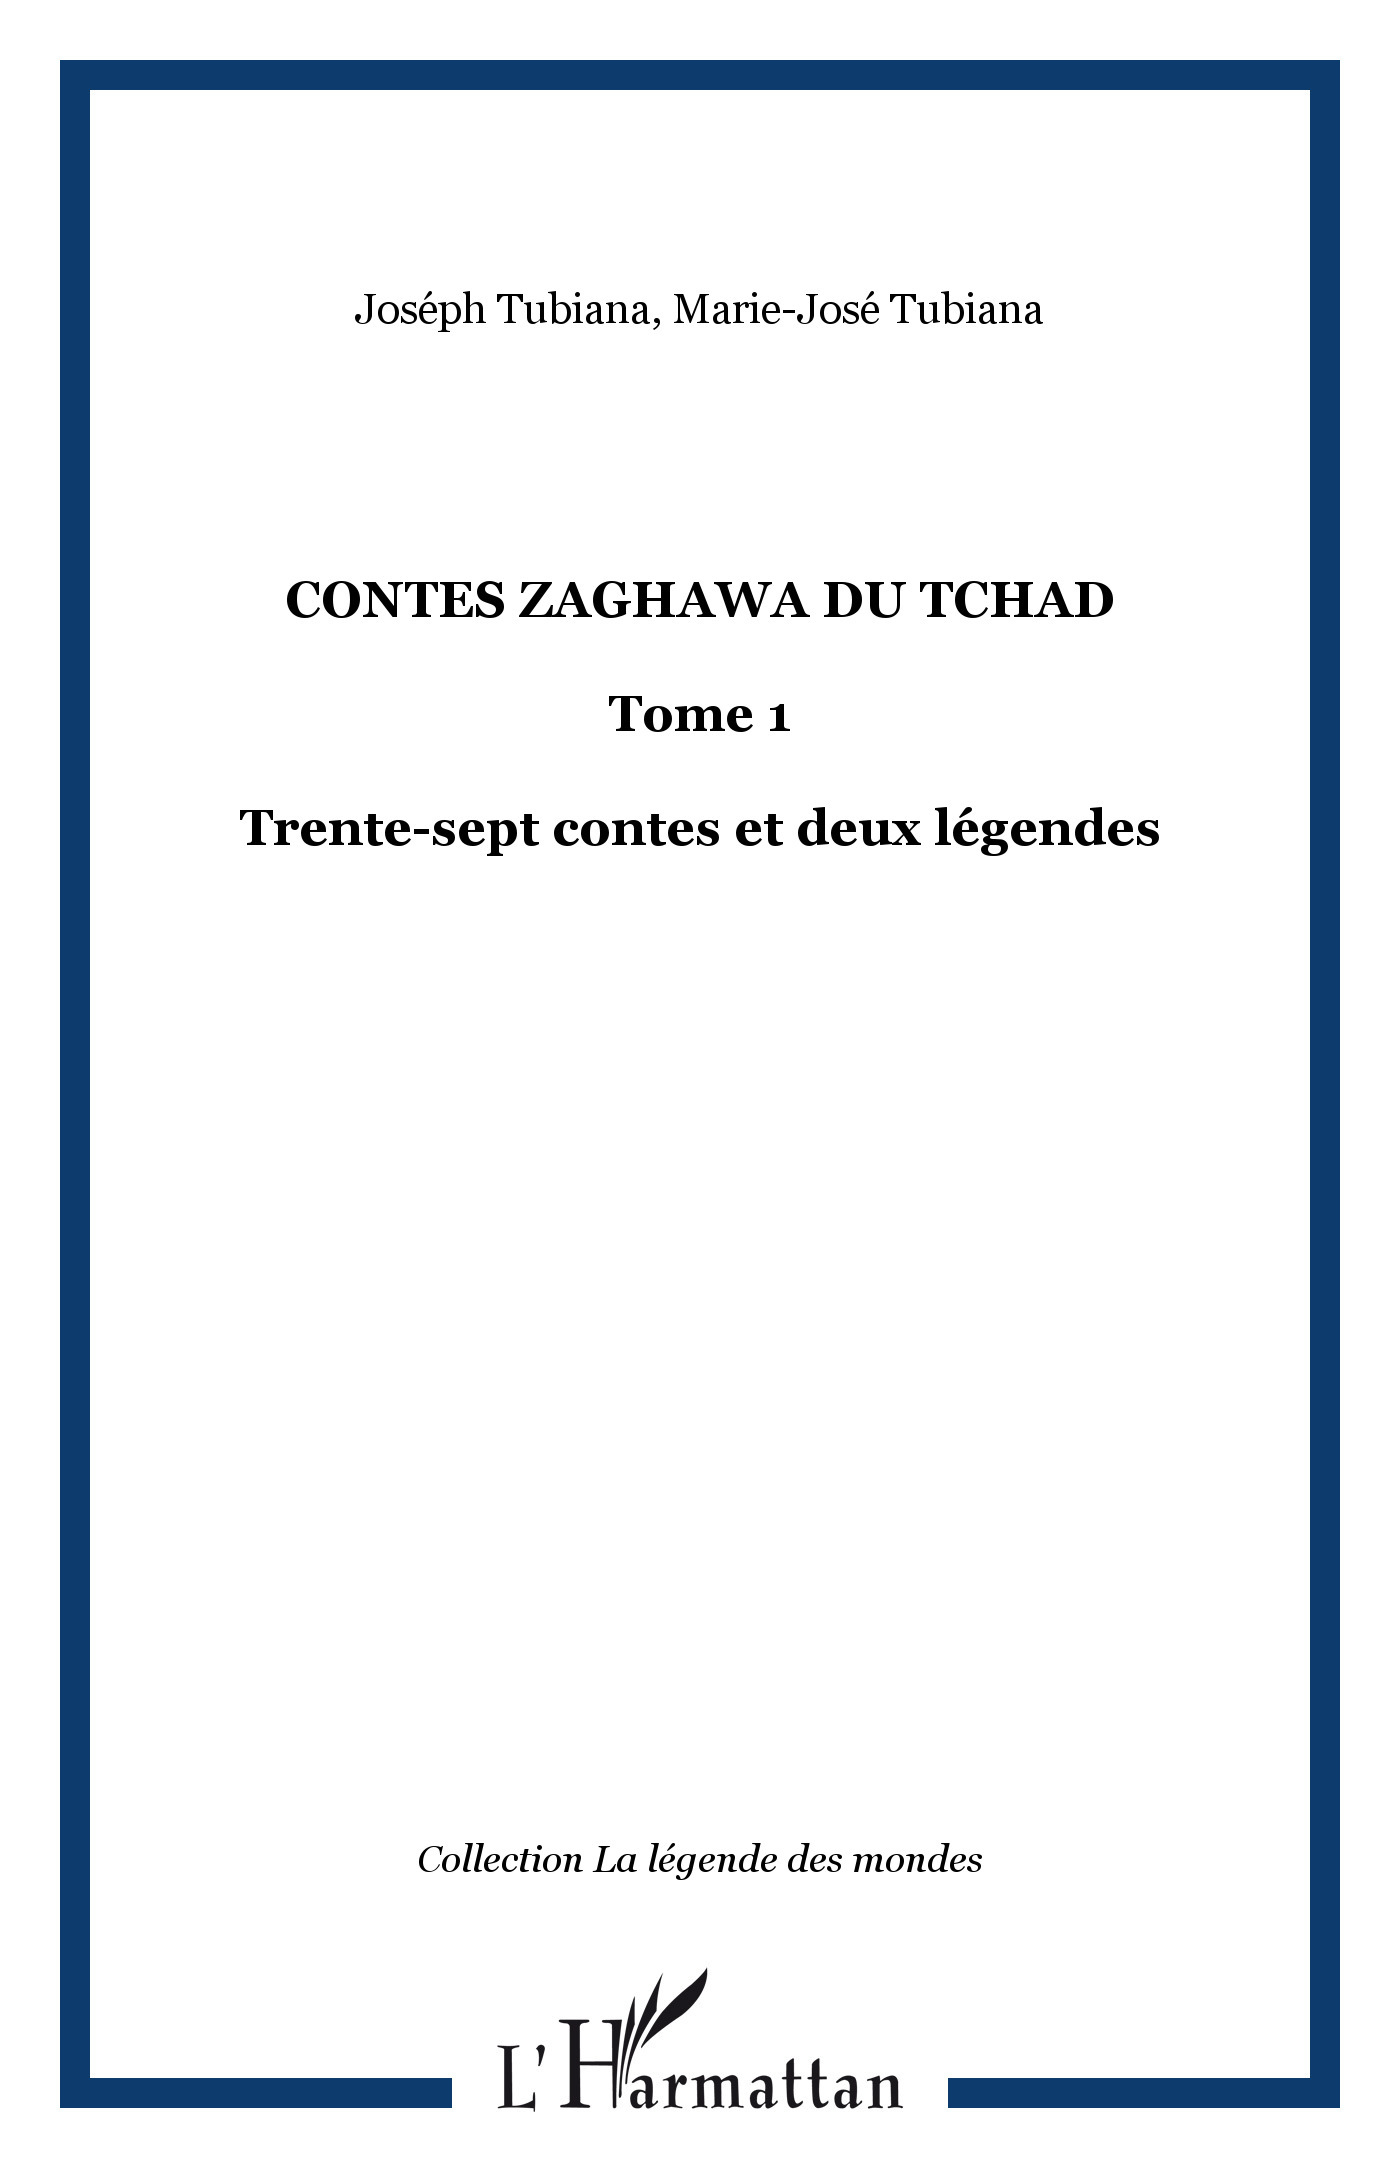 CONTES ZAGHAWA (1) DU TCHAD